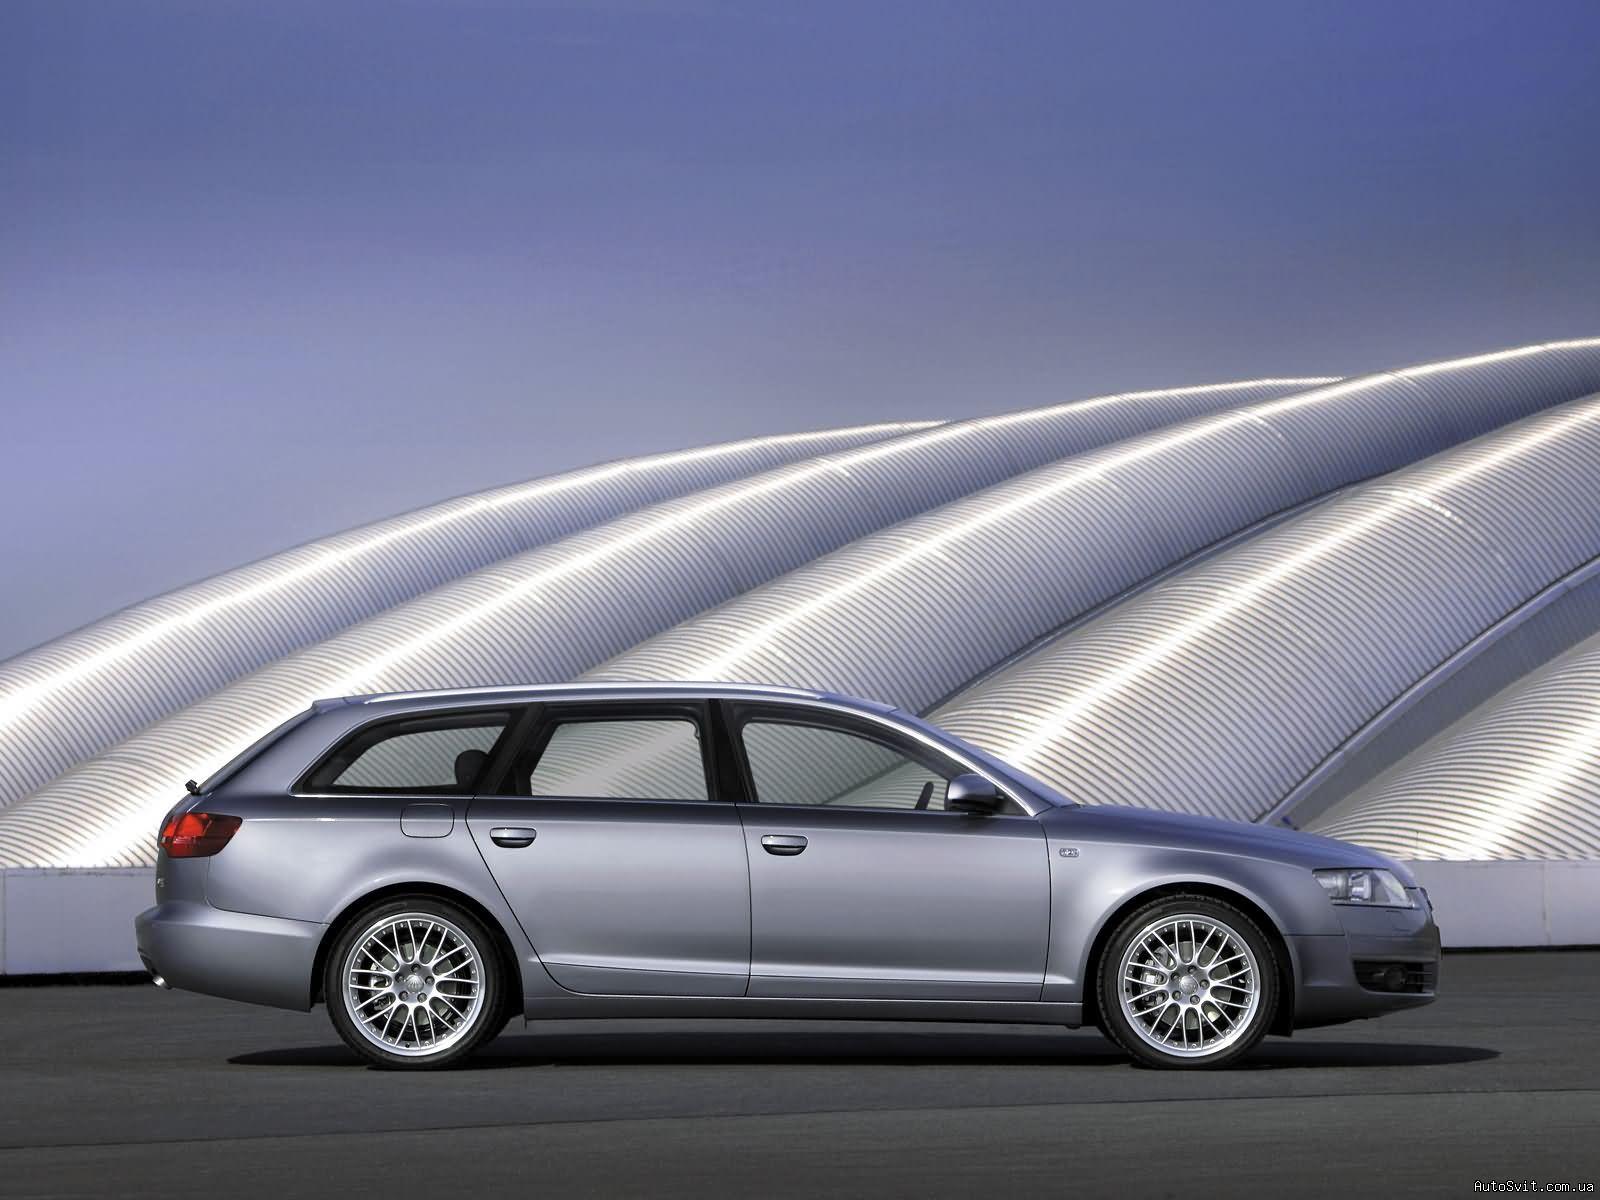 Audi A6 Wallpapers Audiwallpapers Net